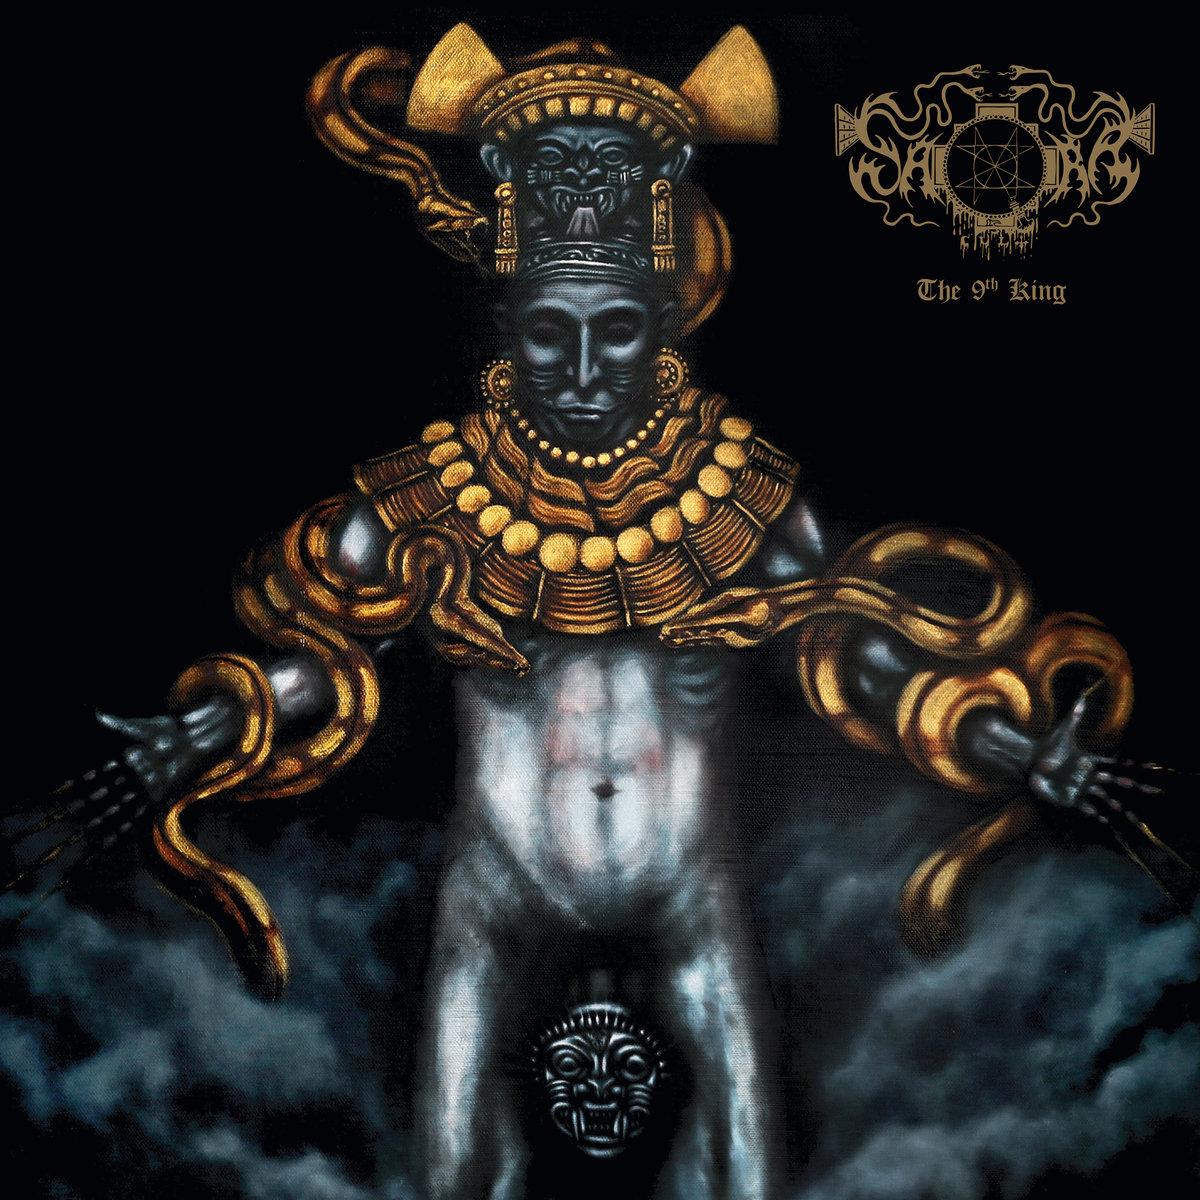 SAQRA'S CULT - The 9th King